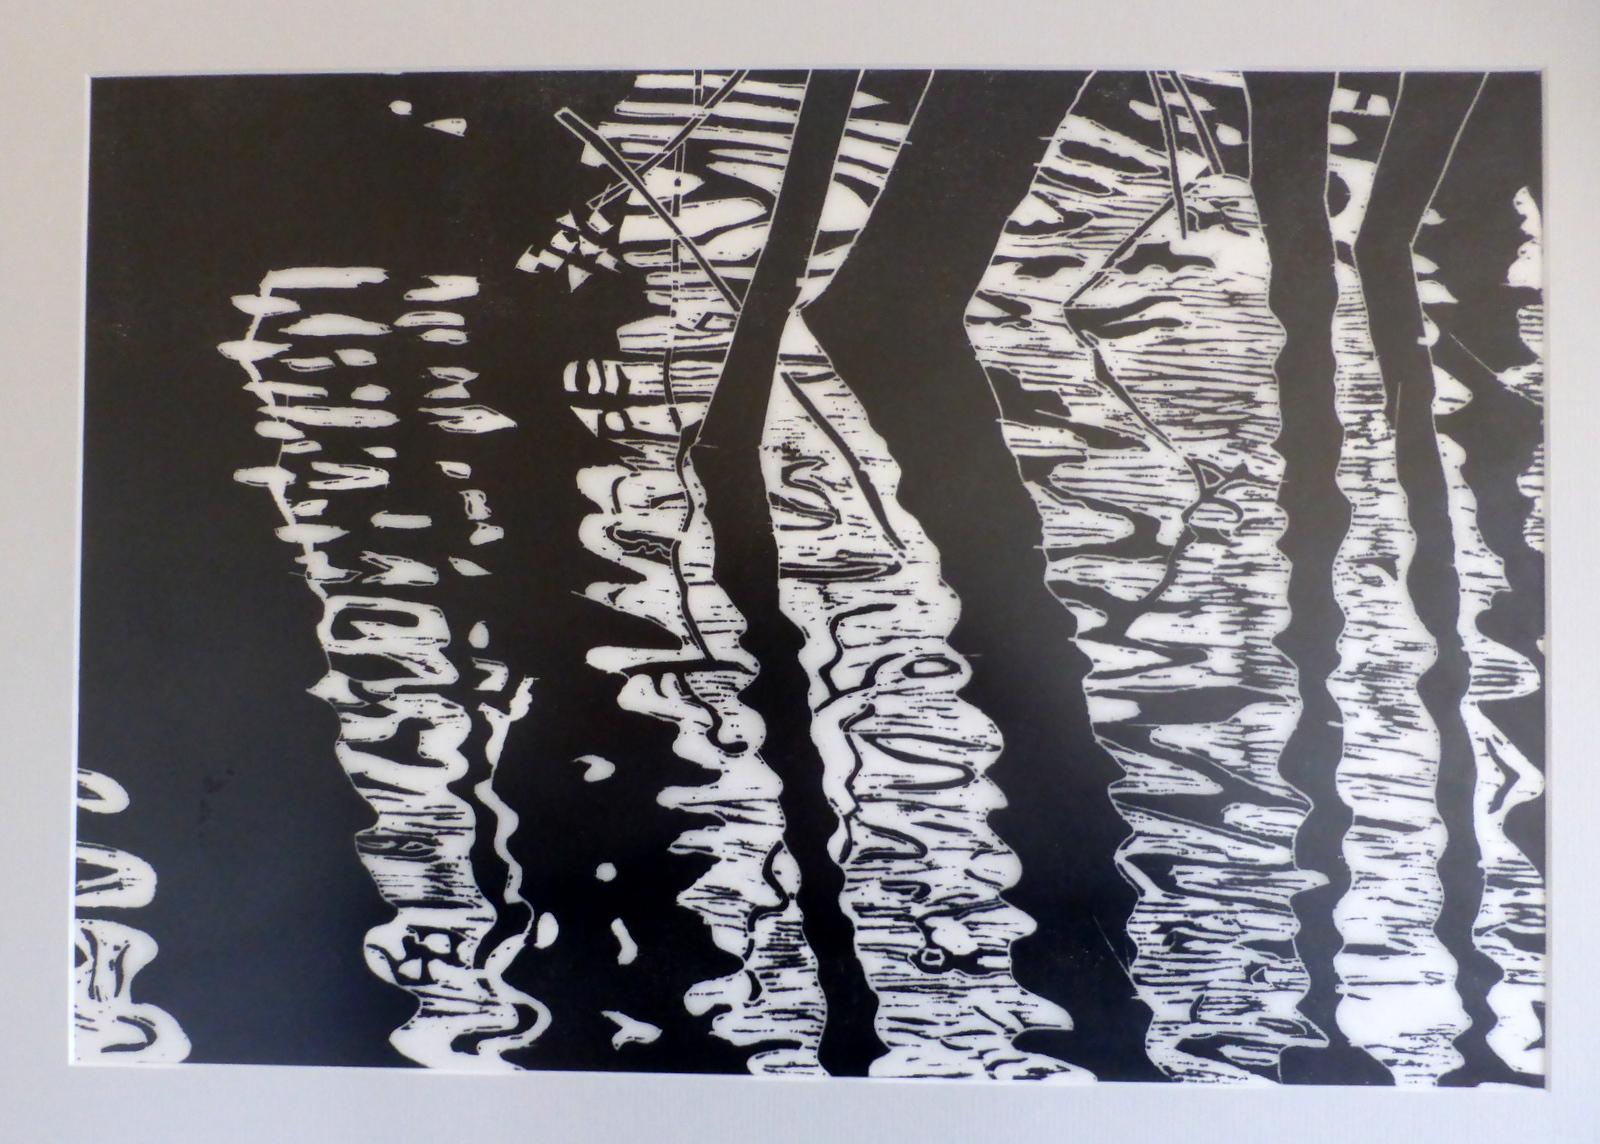 Water trees 1 , Katherine White, wood block print